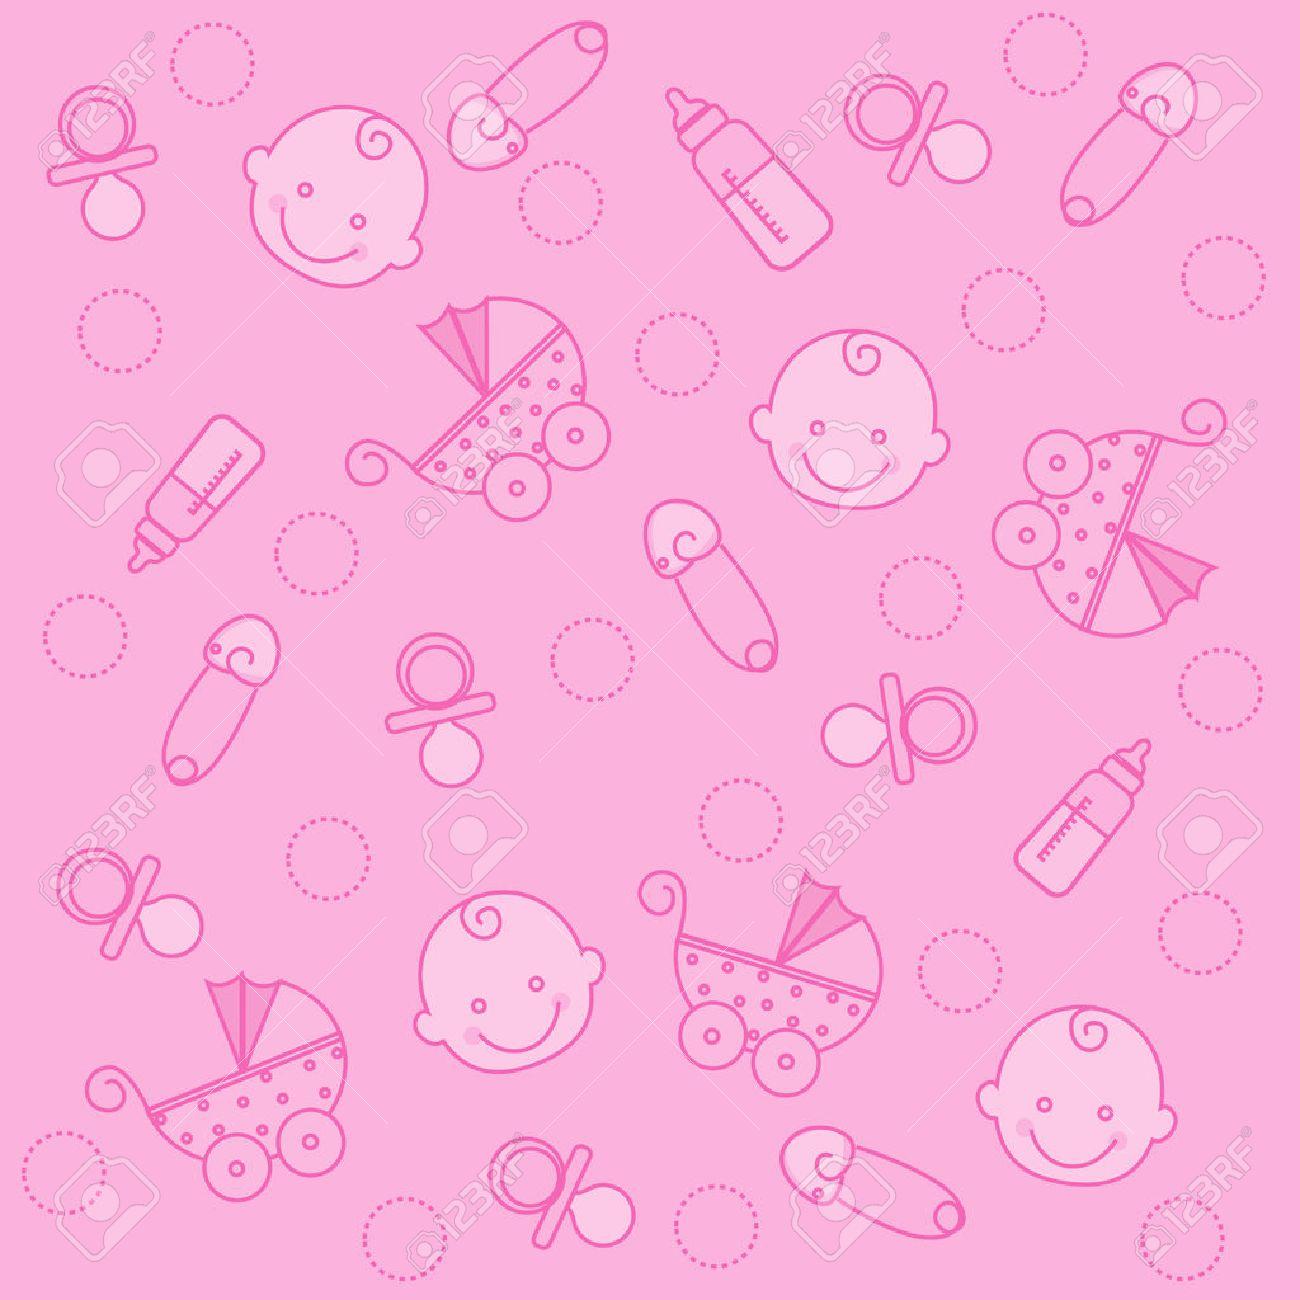 standard bild ser rosafarbenes babymdchen elemente nahtlose muster tapeten - Muster Tapeten